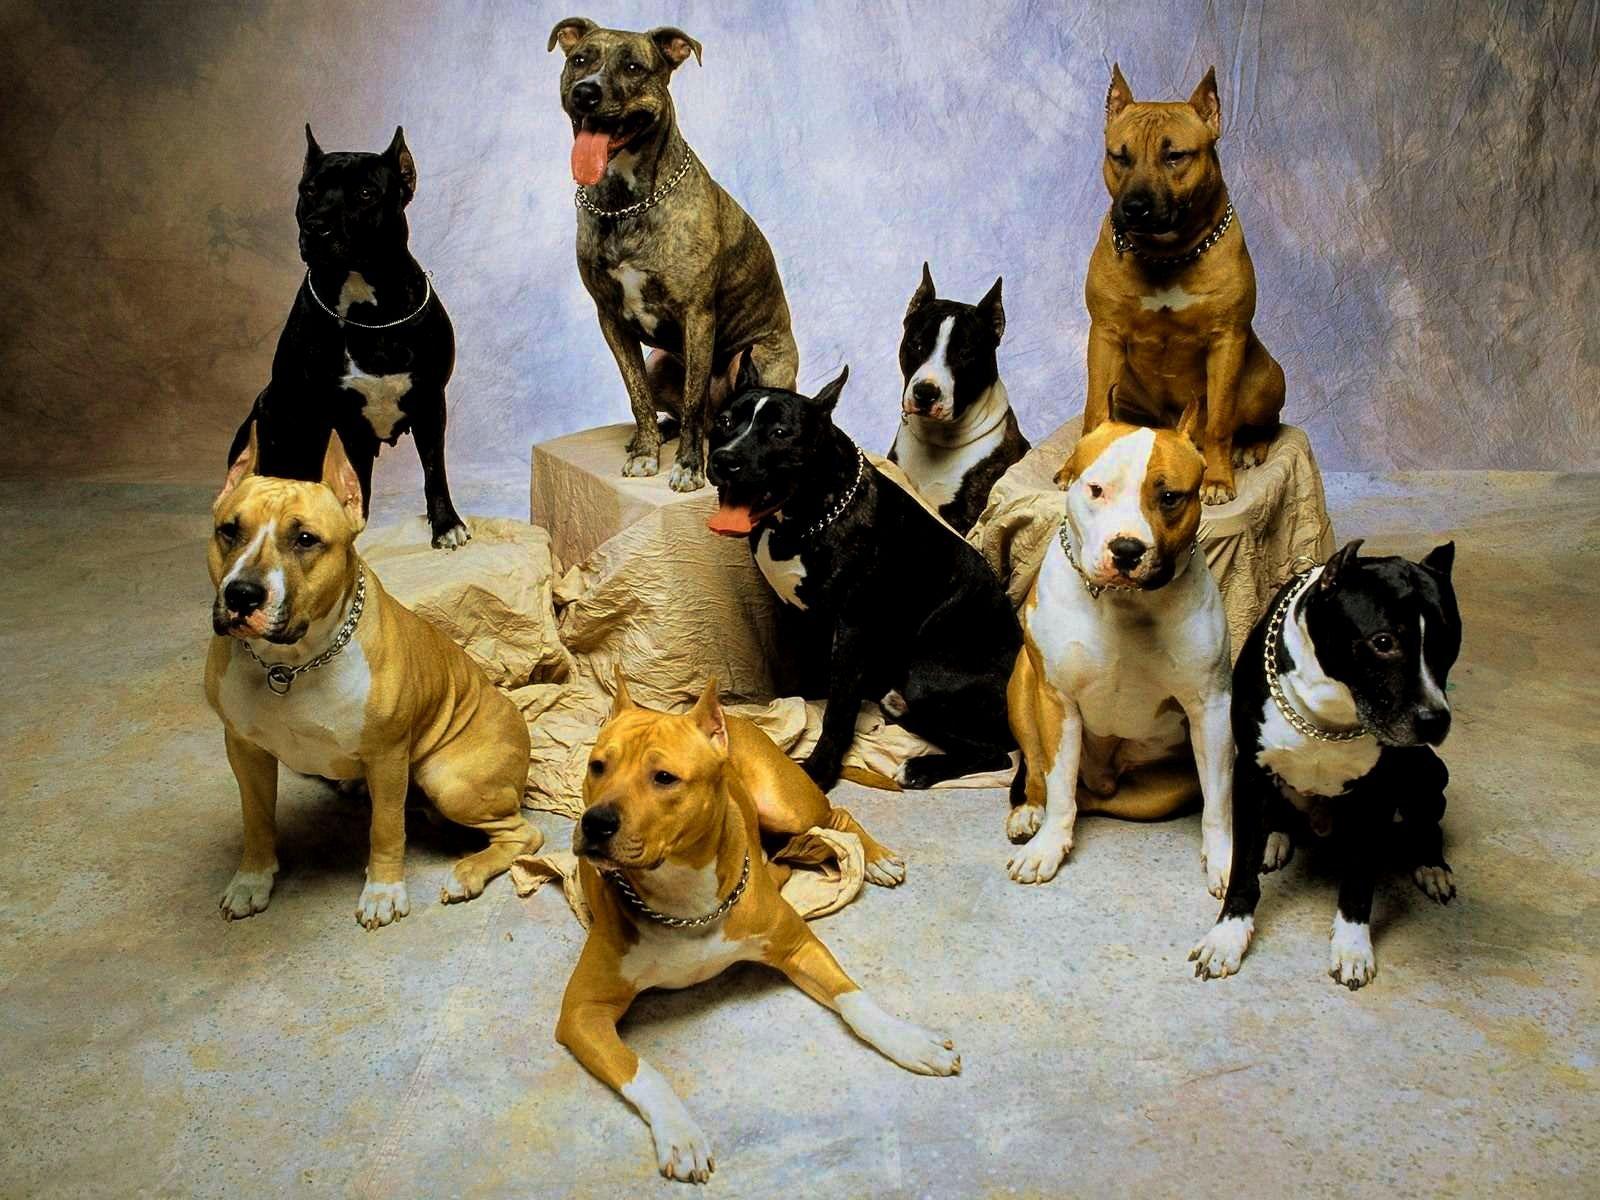 Dog Breed Wallpaper Pitbull Dog Breed Australian Dog Breeds Pitbull Dog